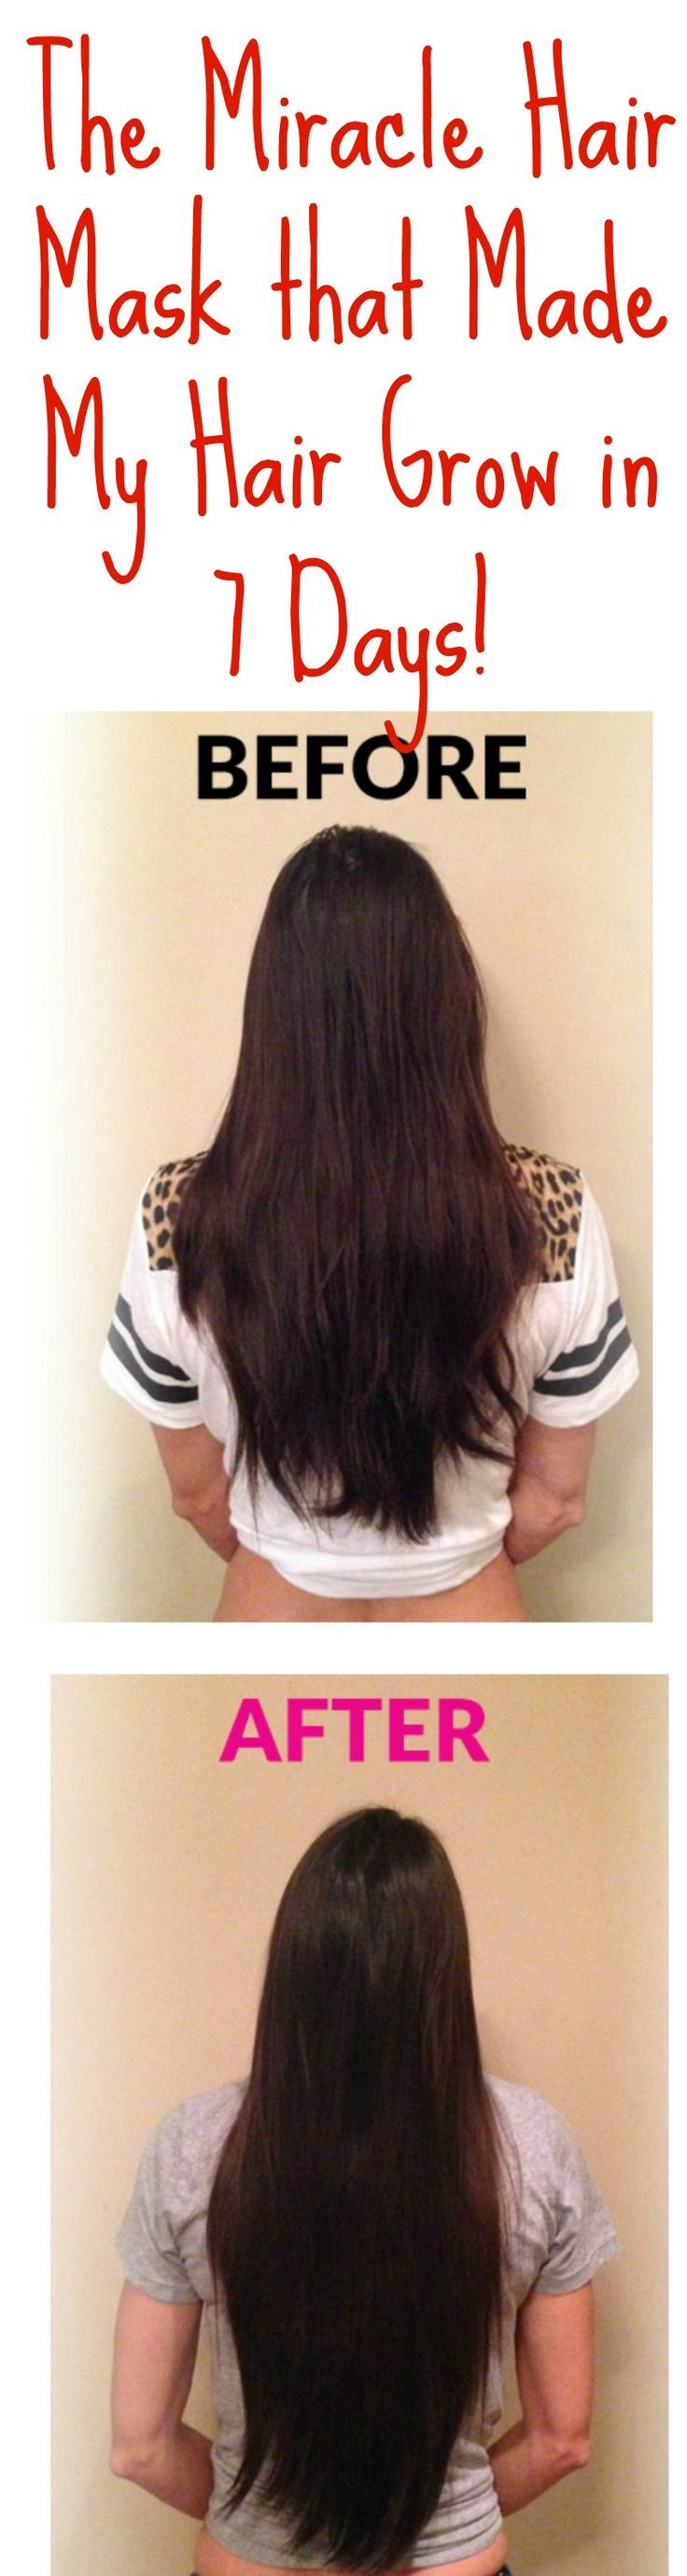 how to help my hair grow longer